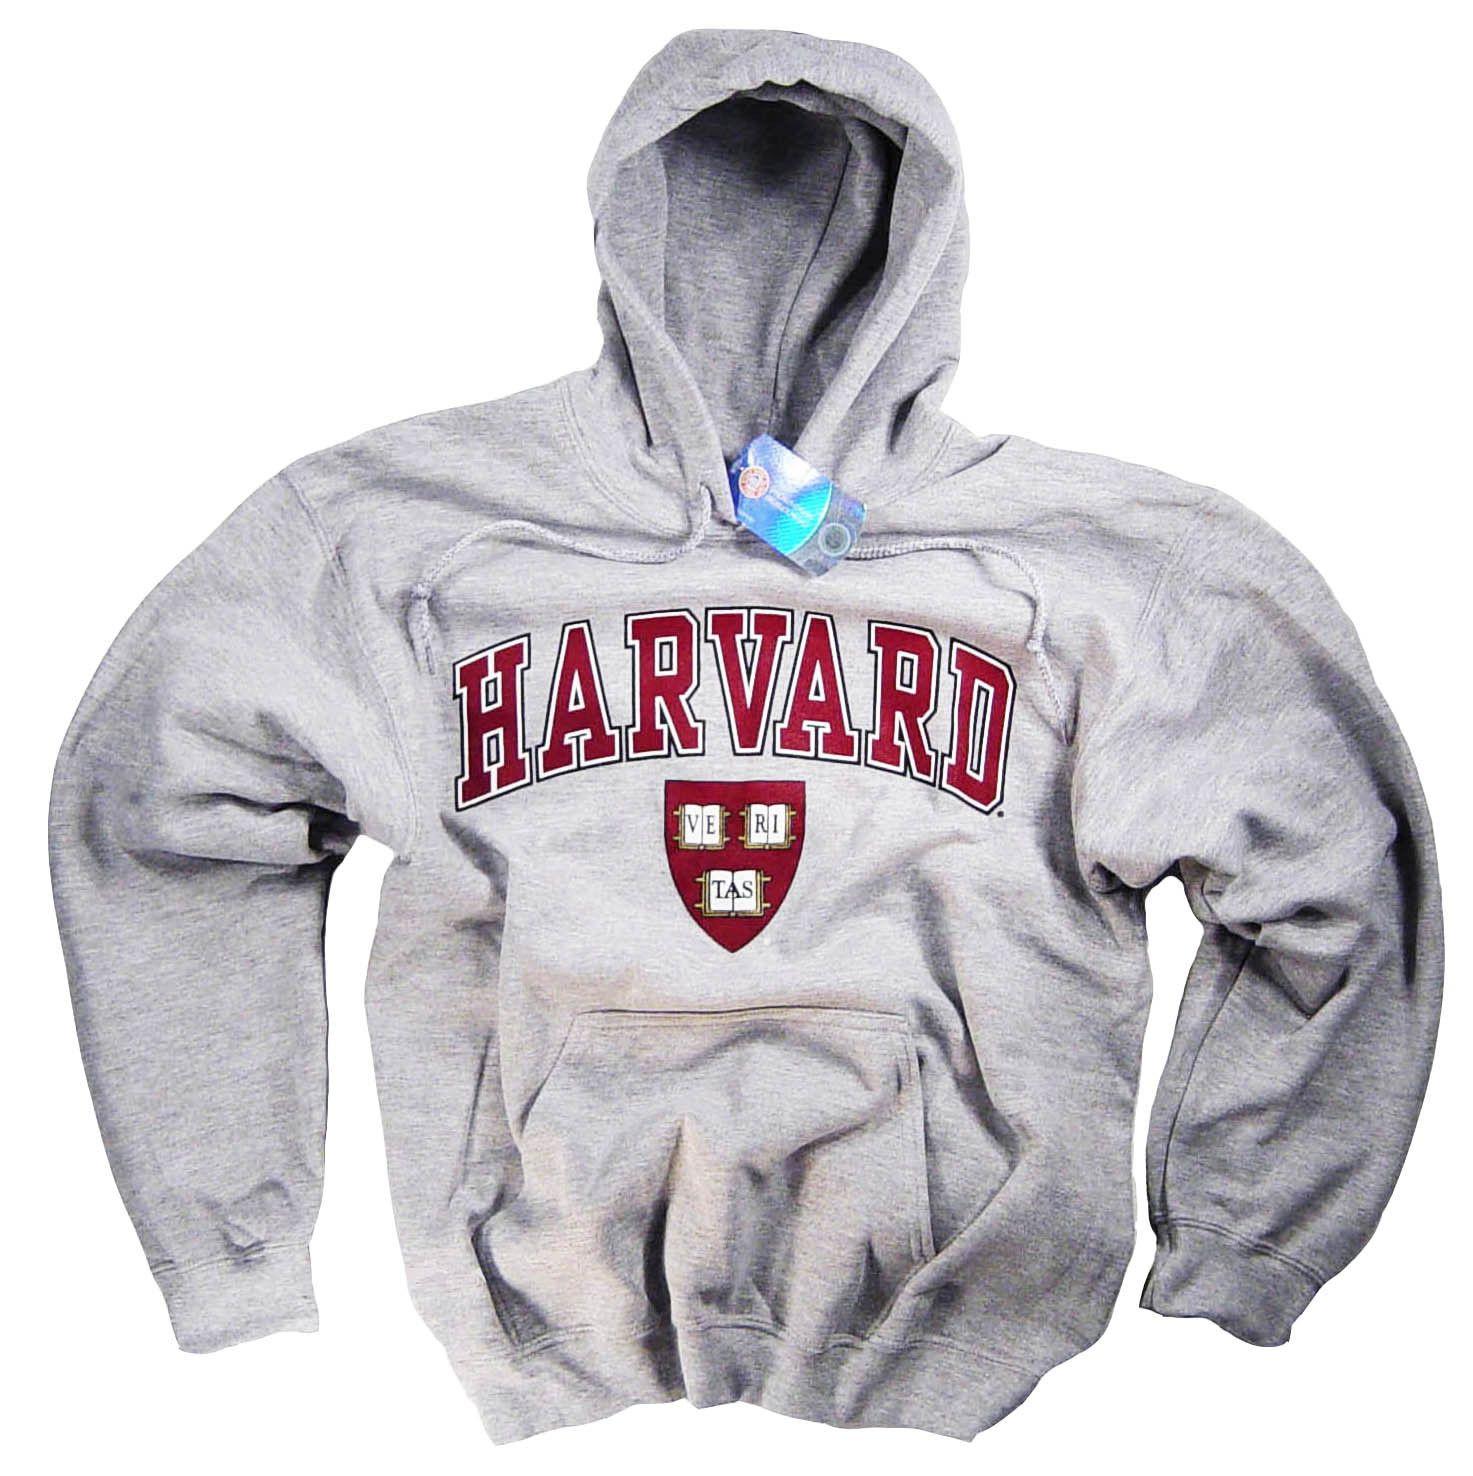 Details about Harvard Shirt Hoodie Sweatshirt College